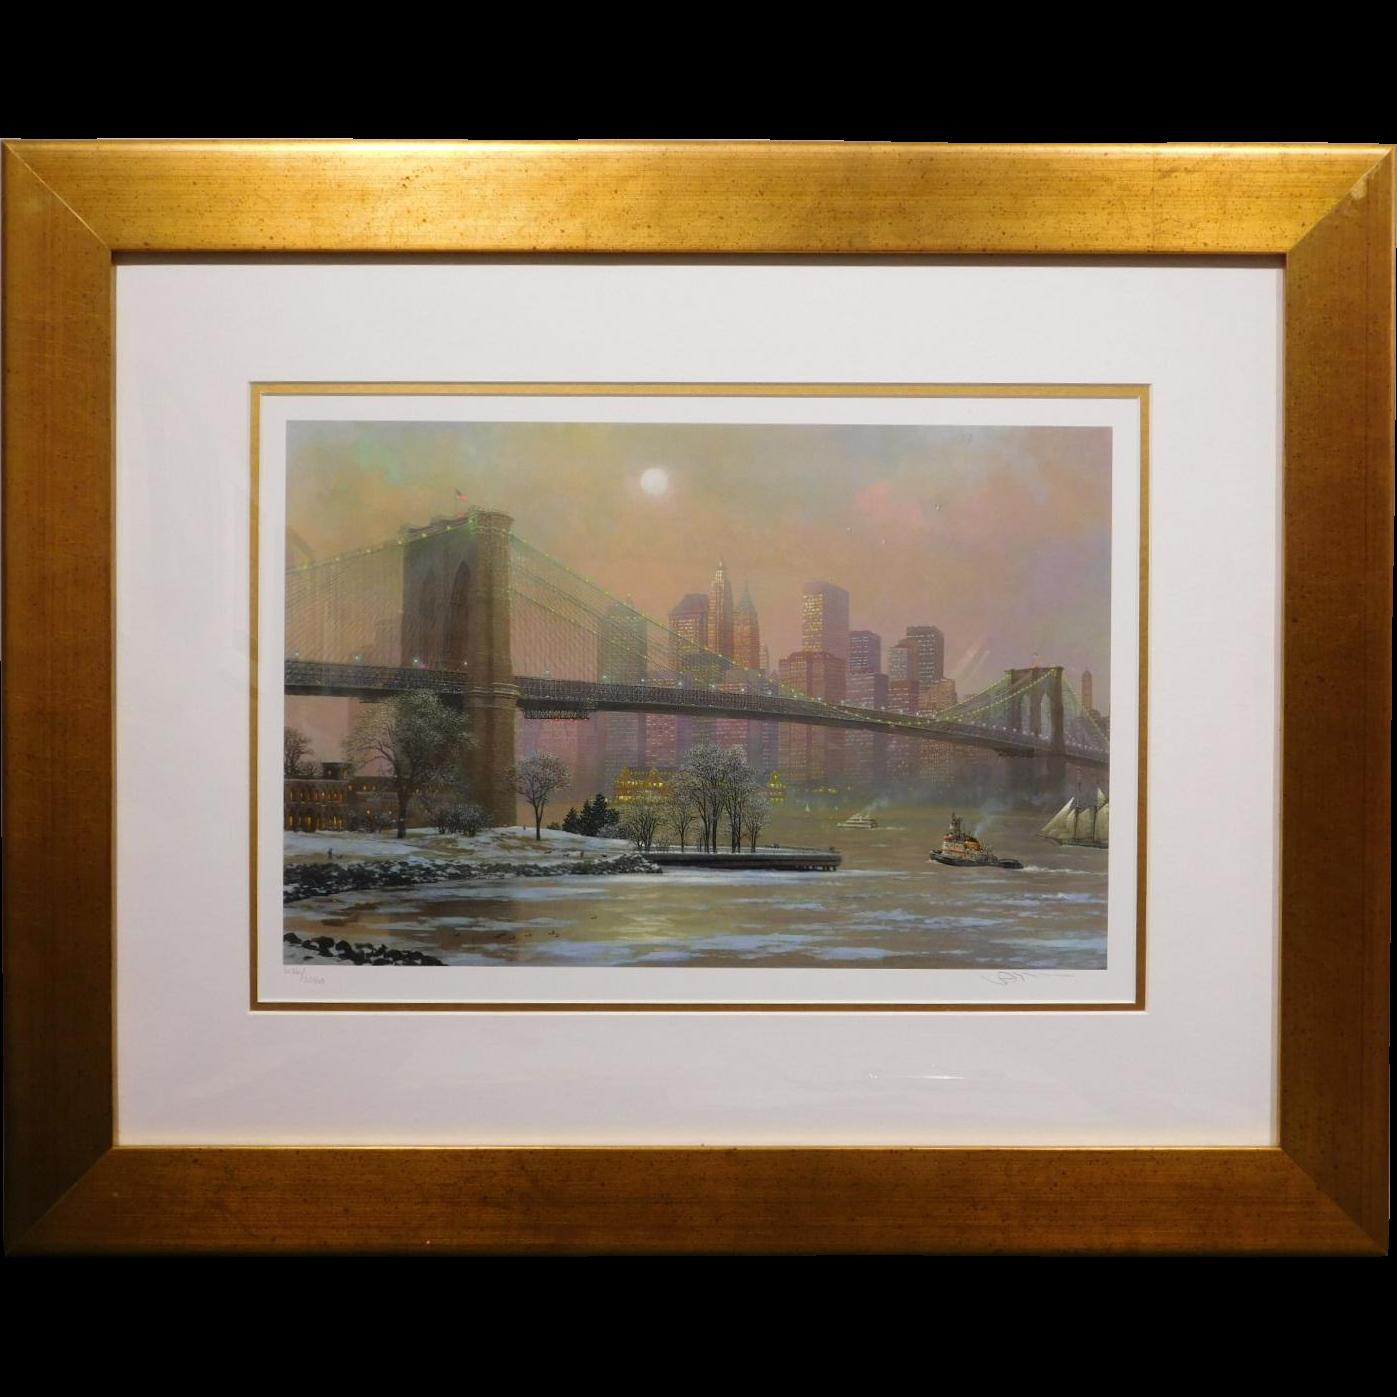 Brooklyn Bridge in Winter by Alexander Chen